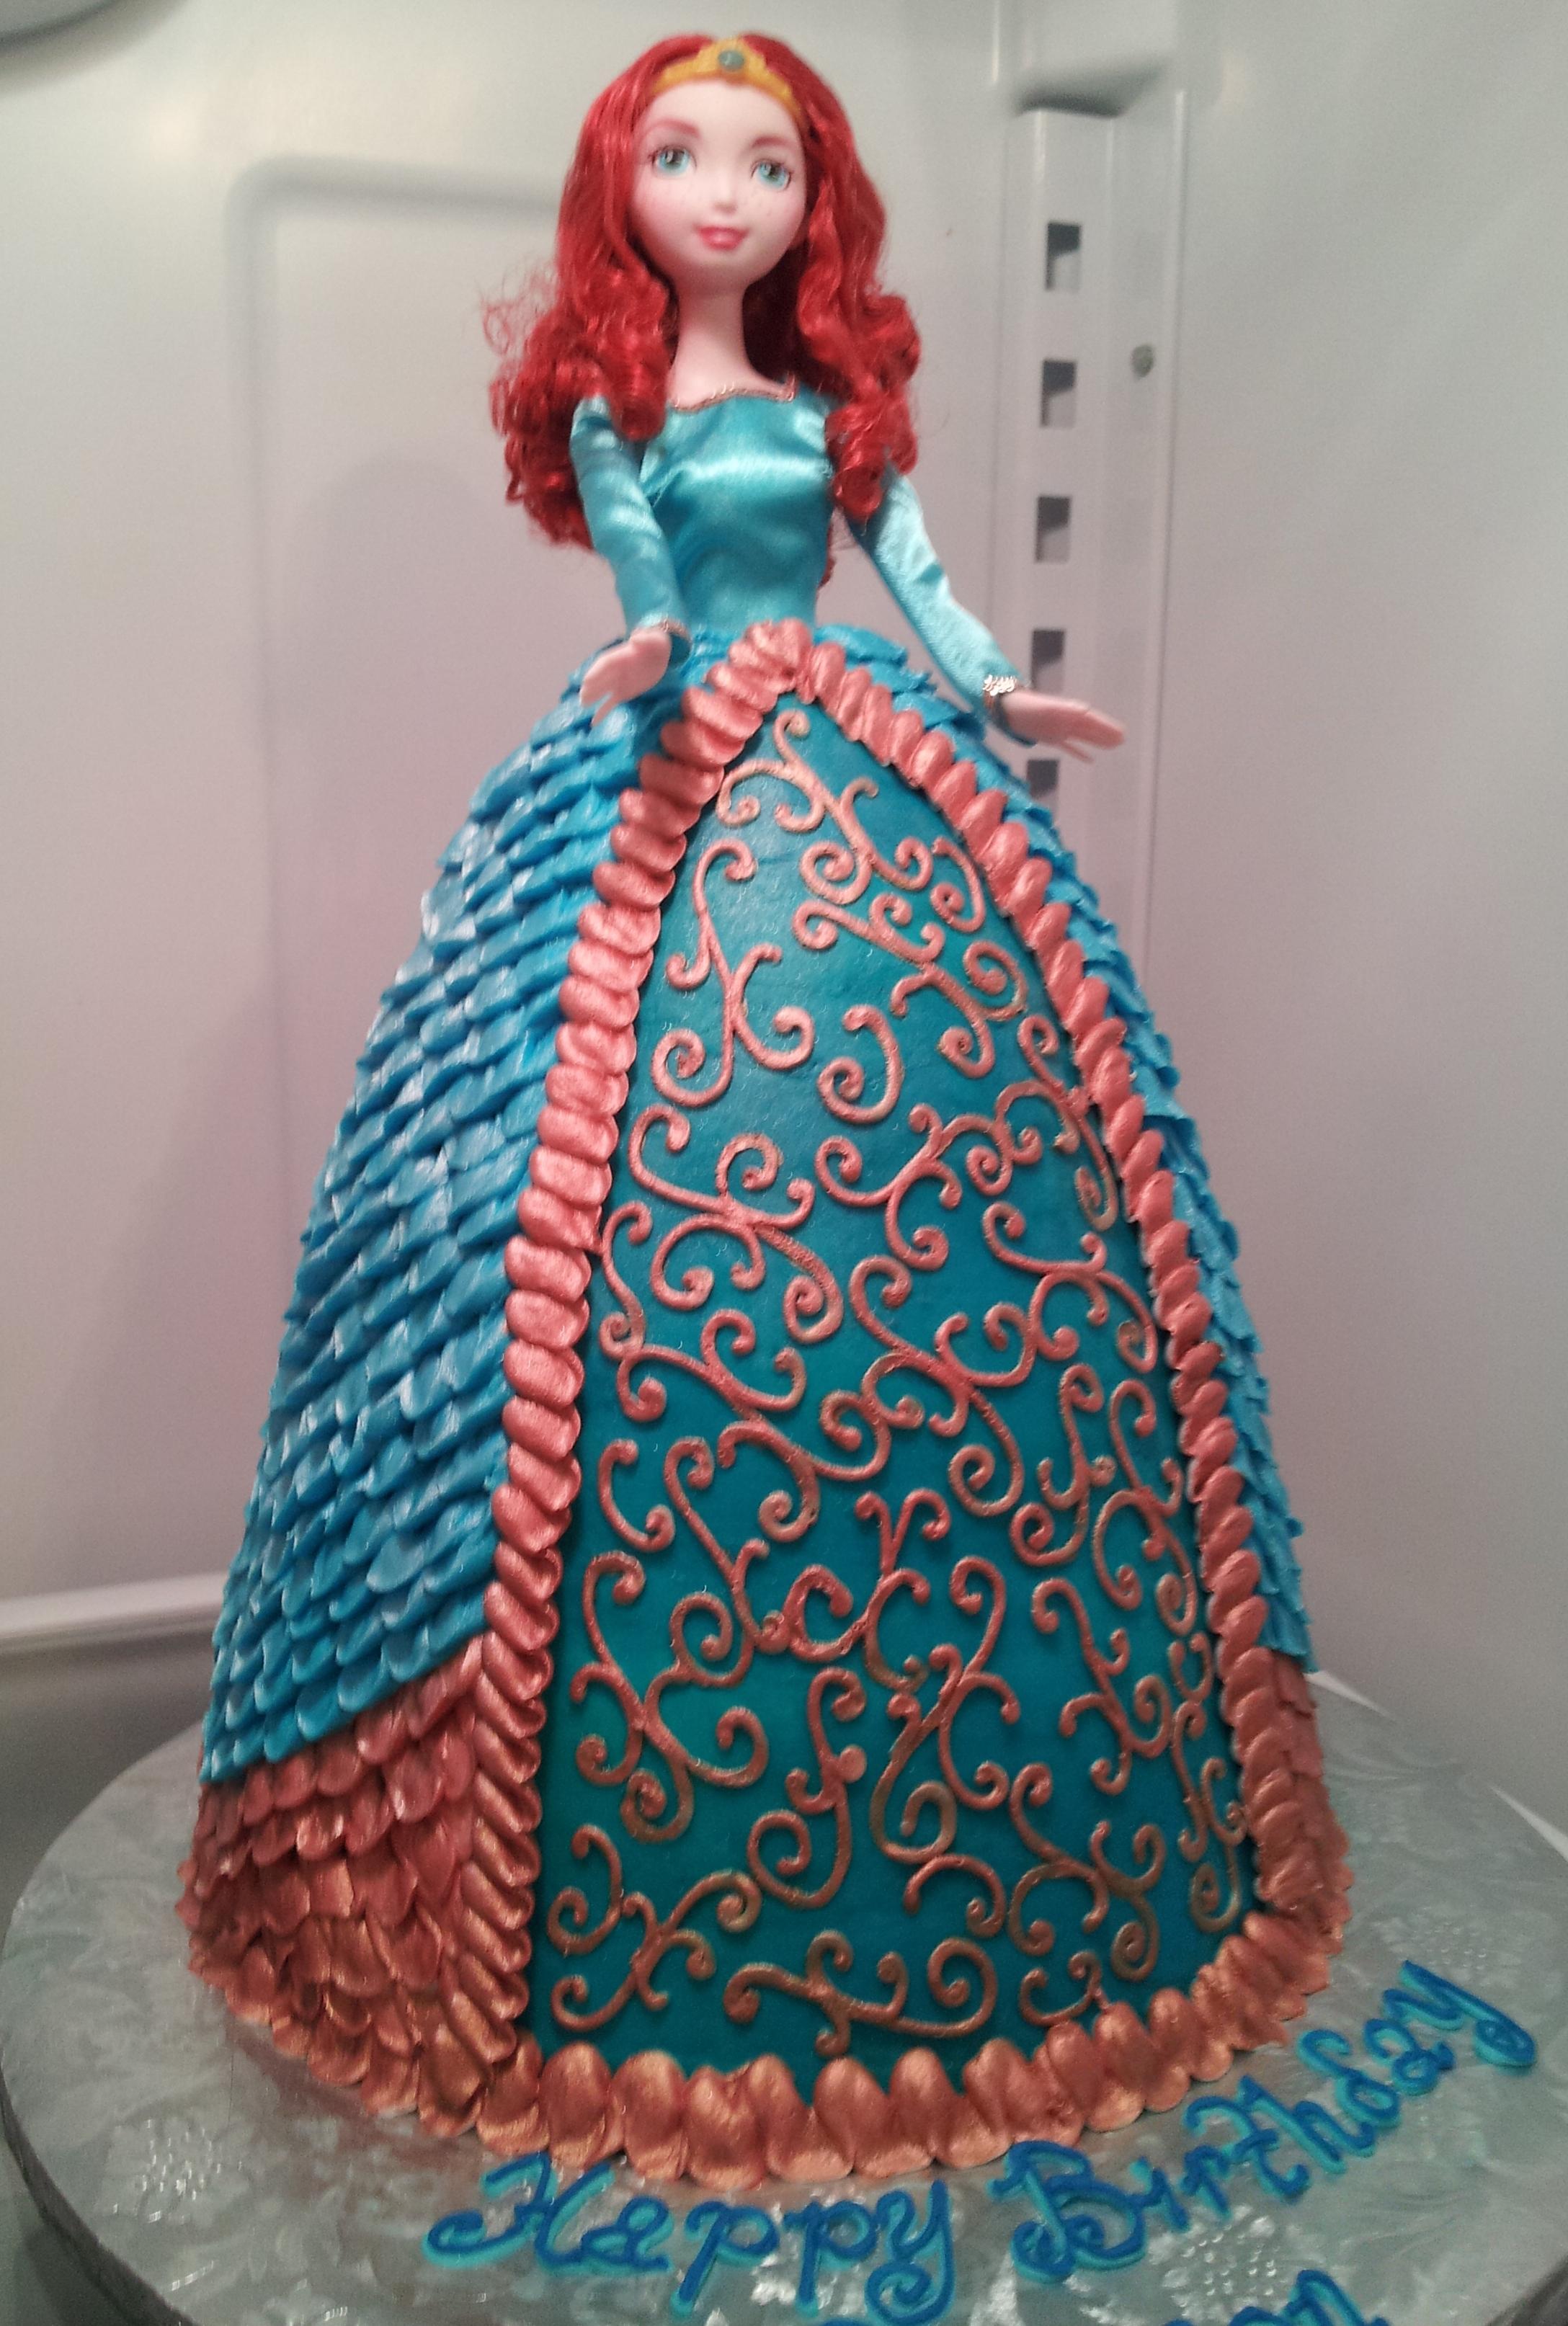 Doll Cake- Brave